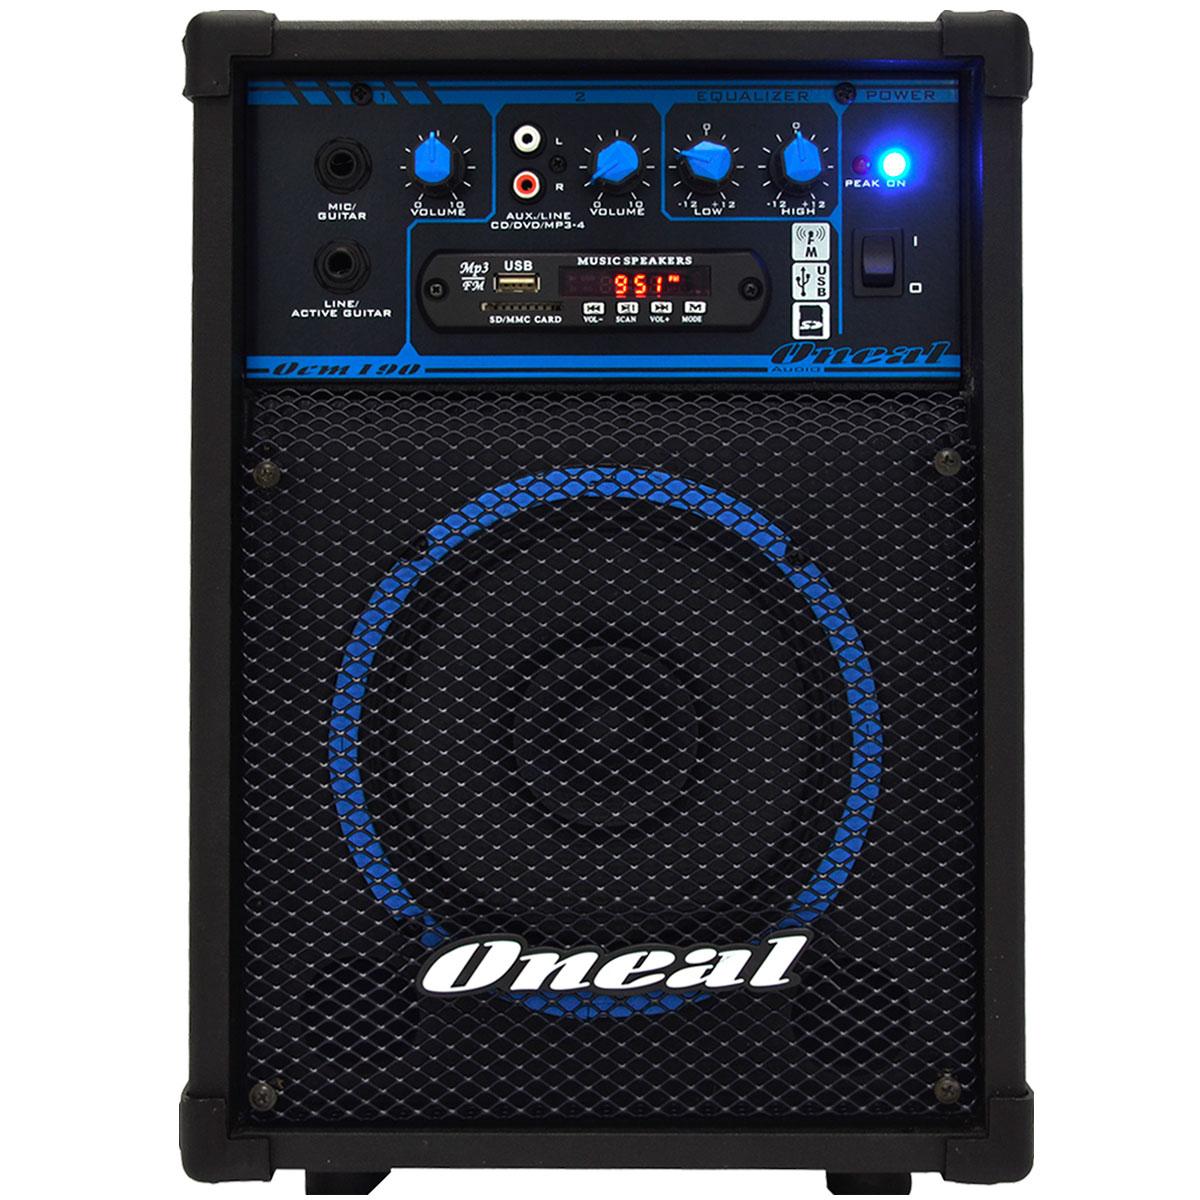 OCM190 - Cubo Multiuso Ativo 40W OCM 190 - Oneal